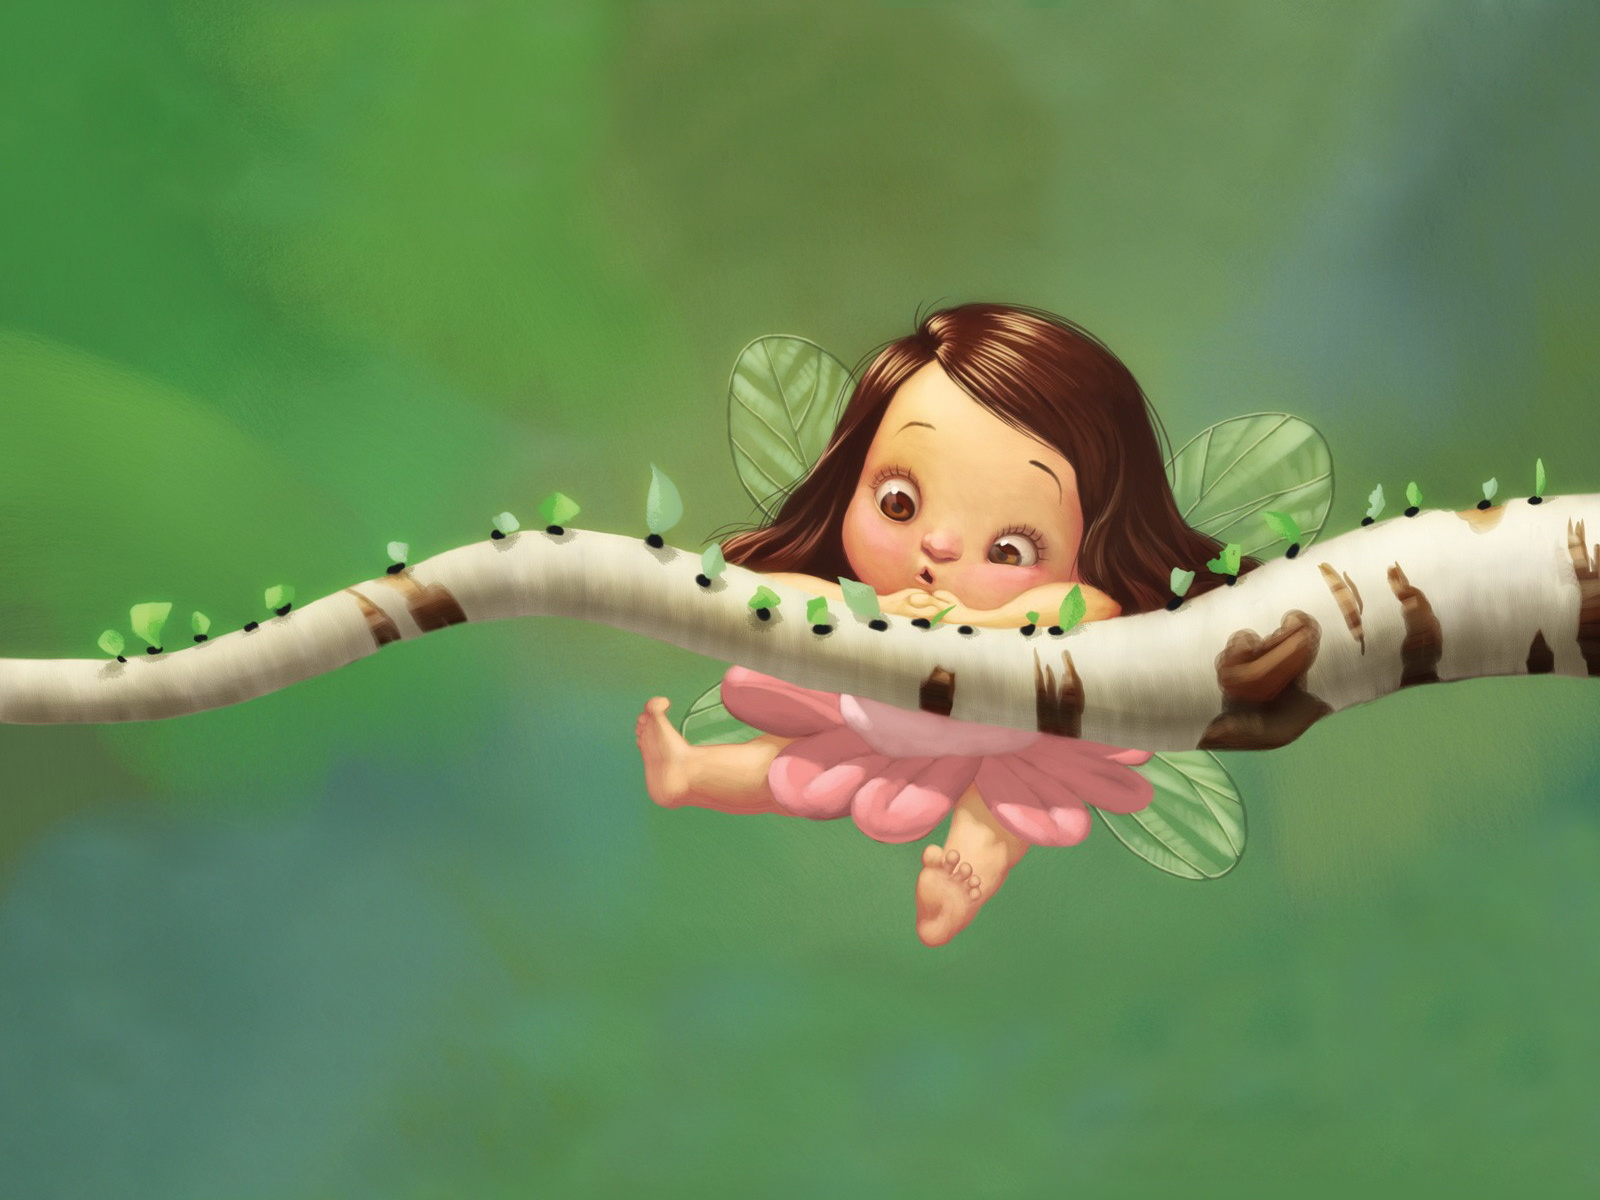 Japan: 3D Fairy wallpaper, Cute Fairy Wallpapers Free Desktop